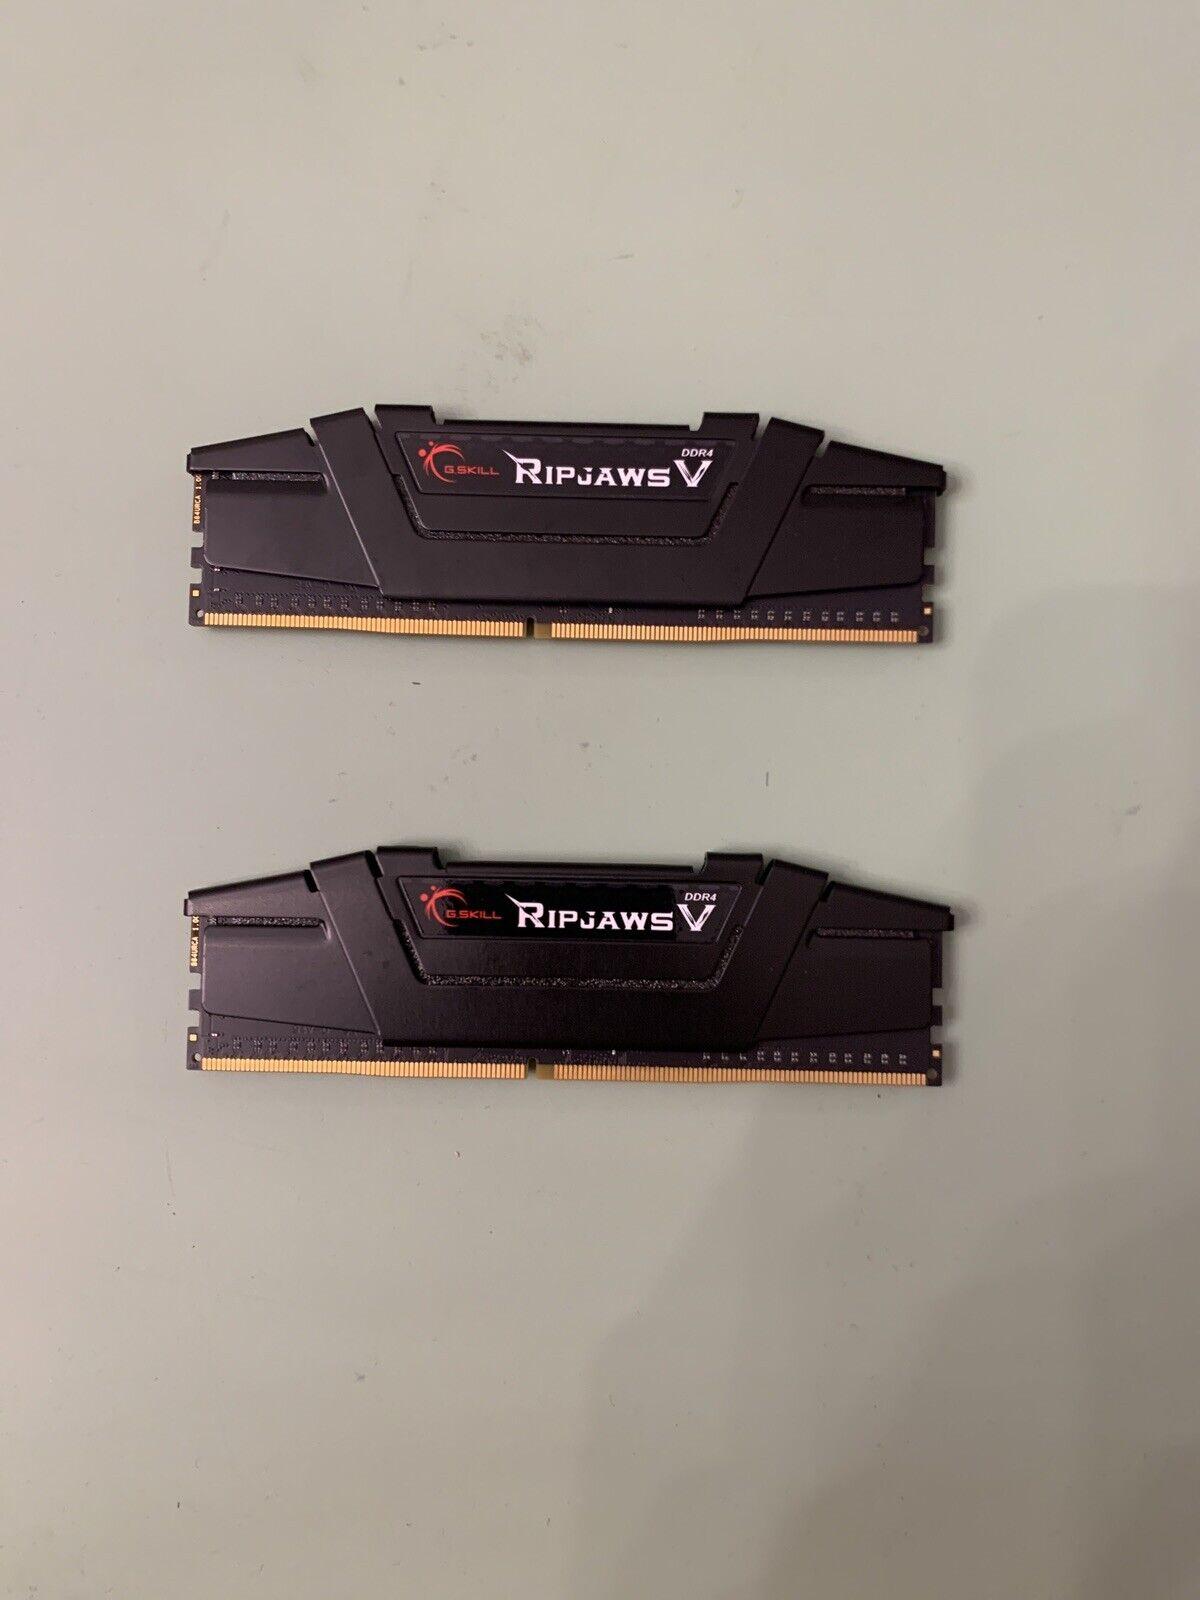 G.SKILL 16GB 2x8GB Ripjaws V Series DDR4 PC4-25600 3200MHz Desktop Memory Model. Buy it now for 75.00